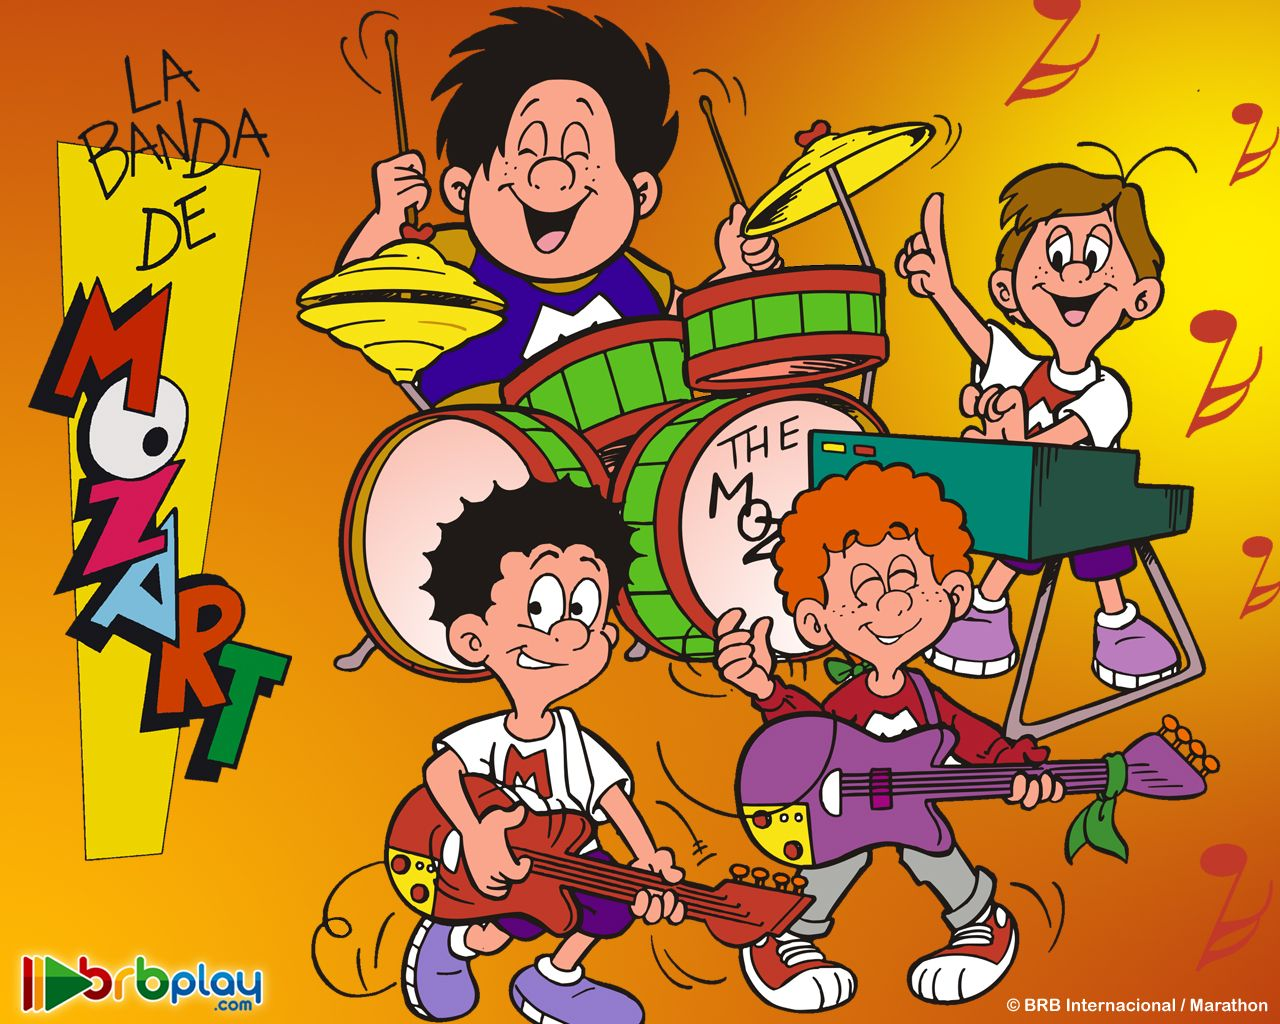 La Banda De Mozart Bandas Banda Caricaturas